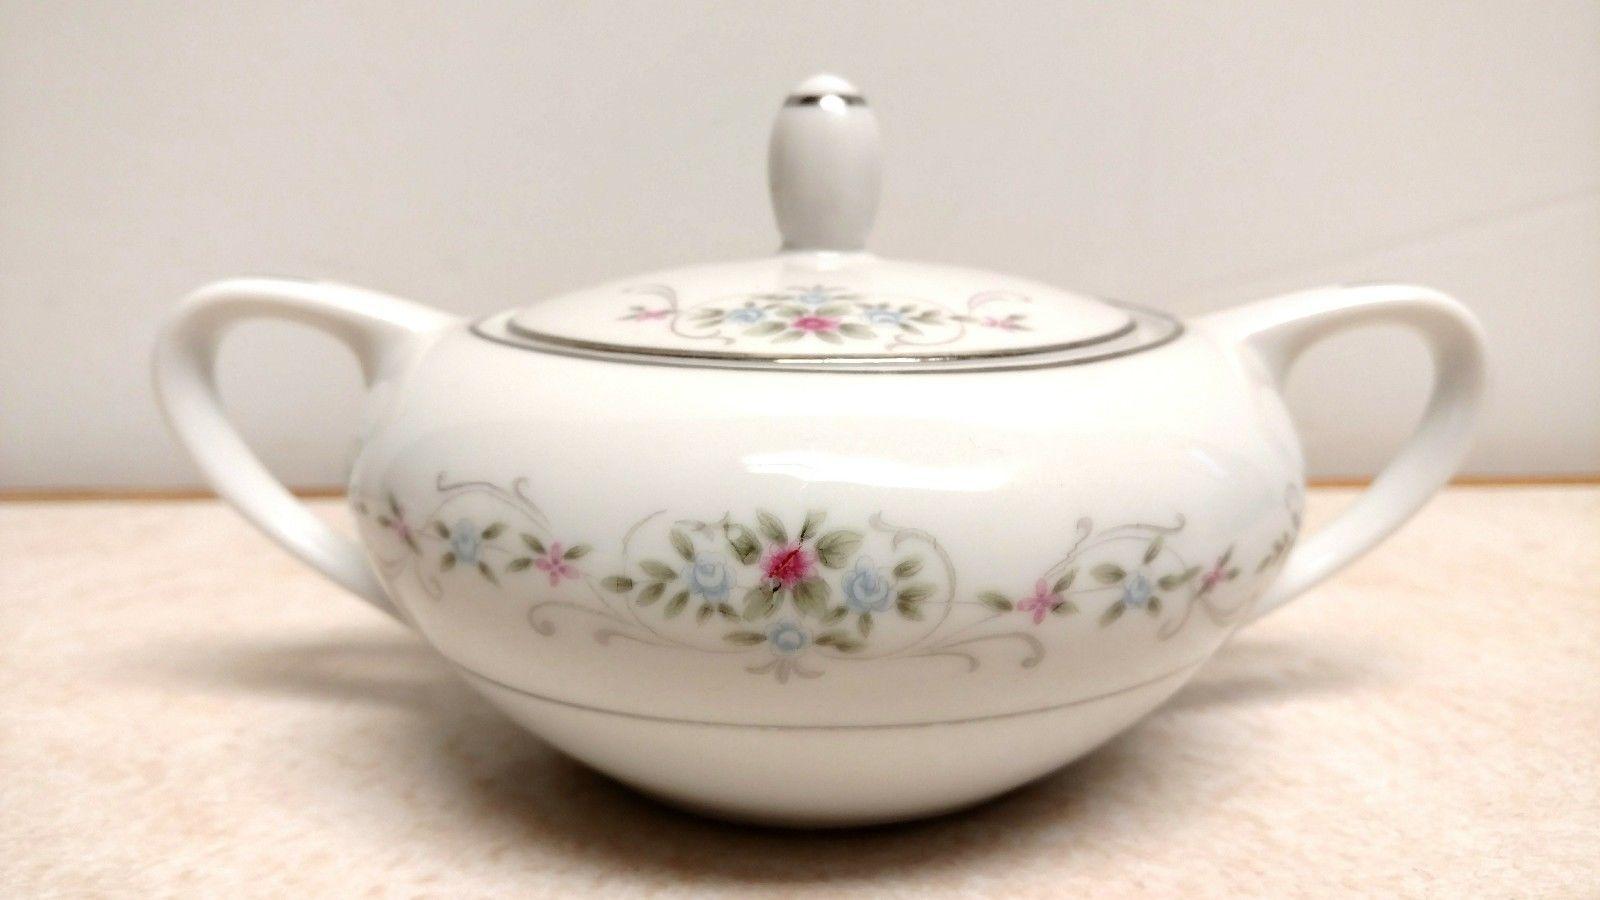 Vintage MILADY China Sugar Bowl Made in Japan Pink & Blue Floral - $9.49